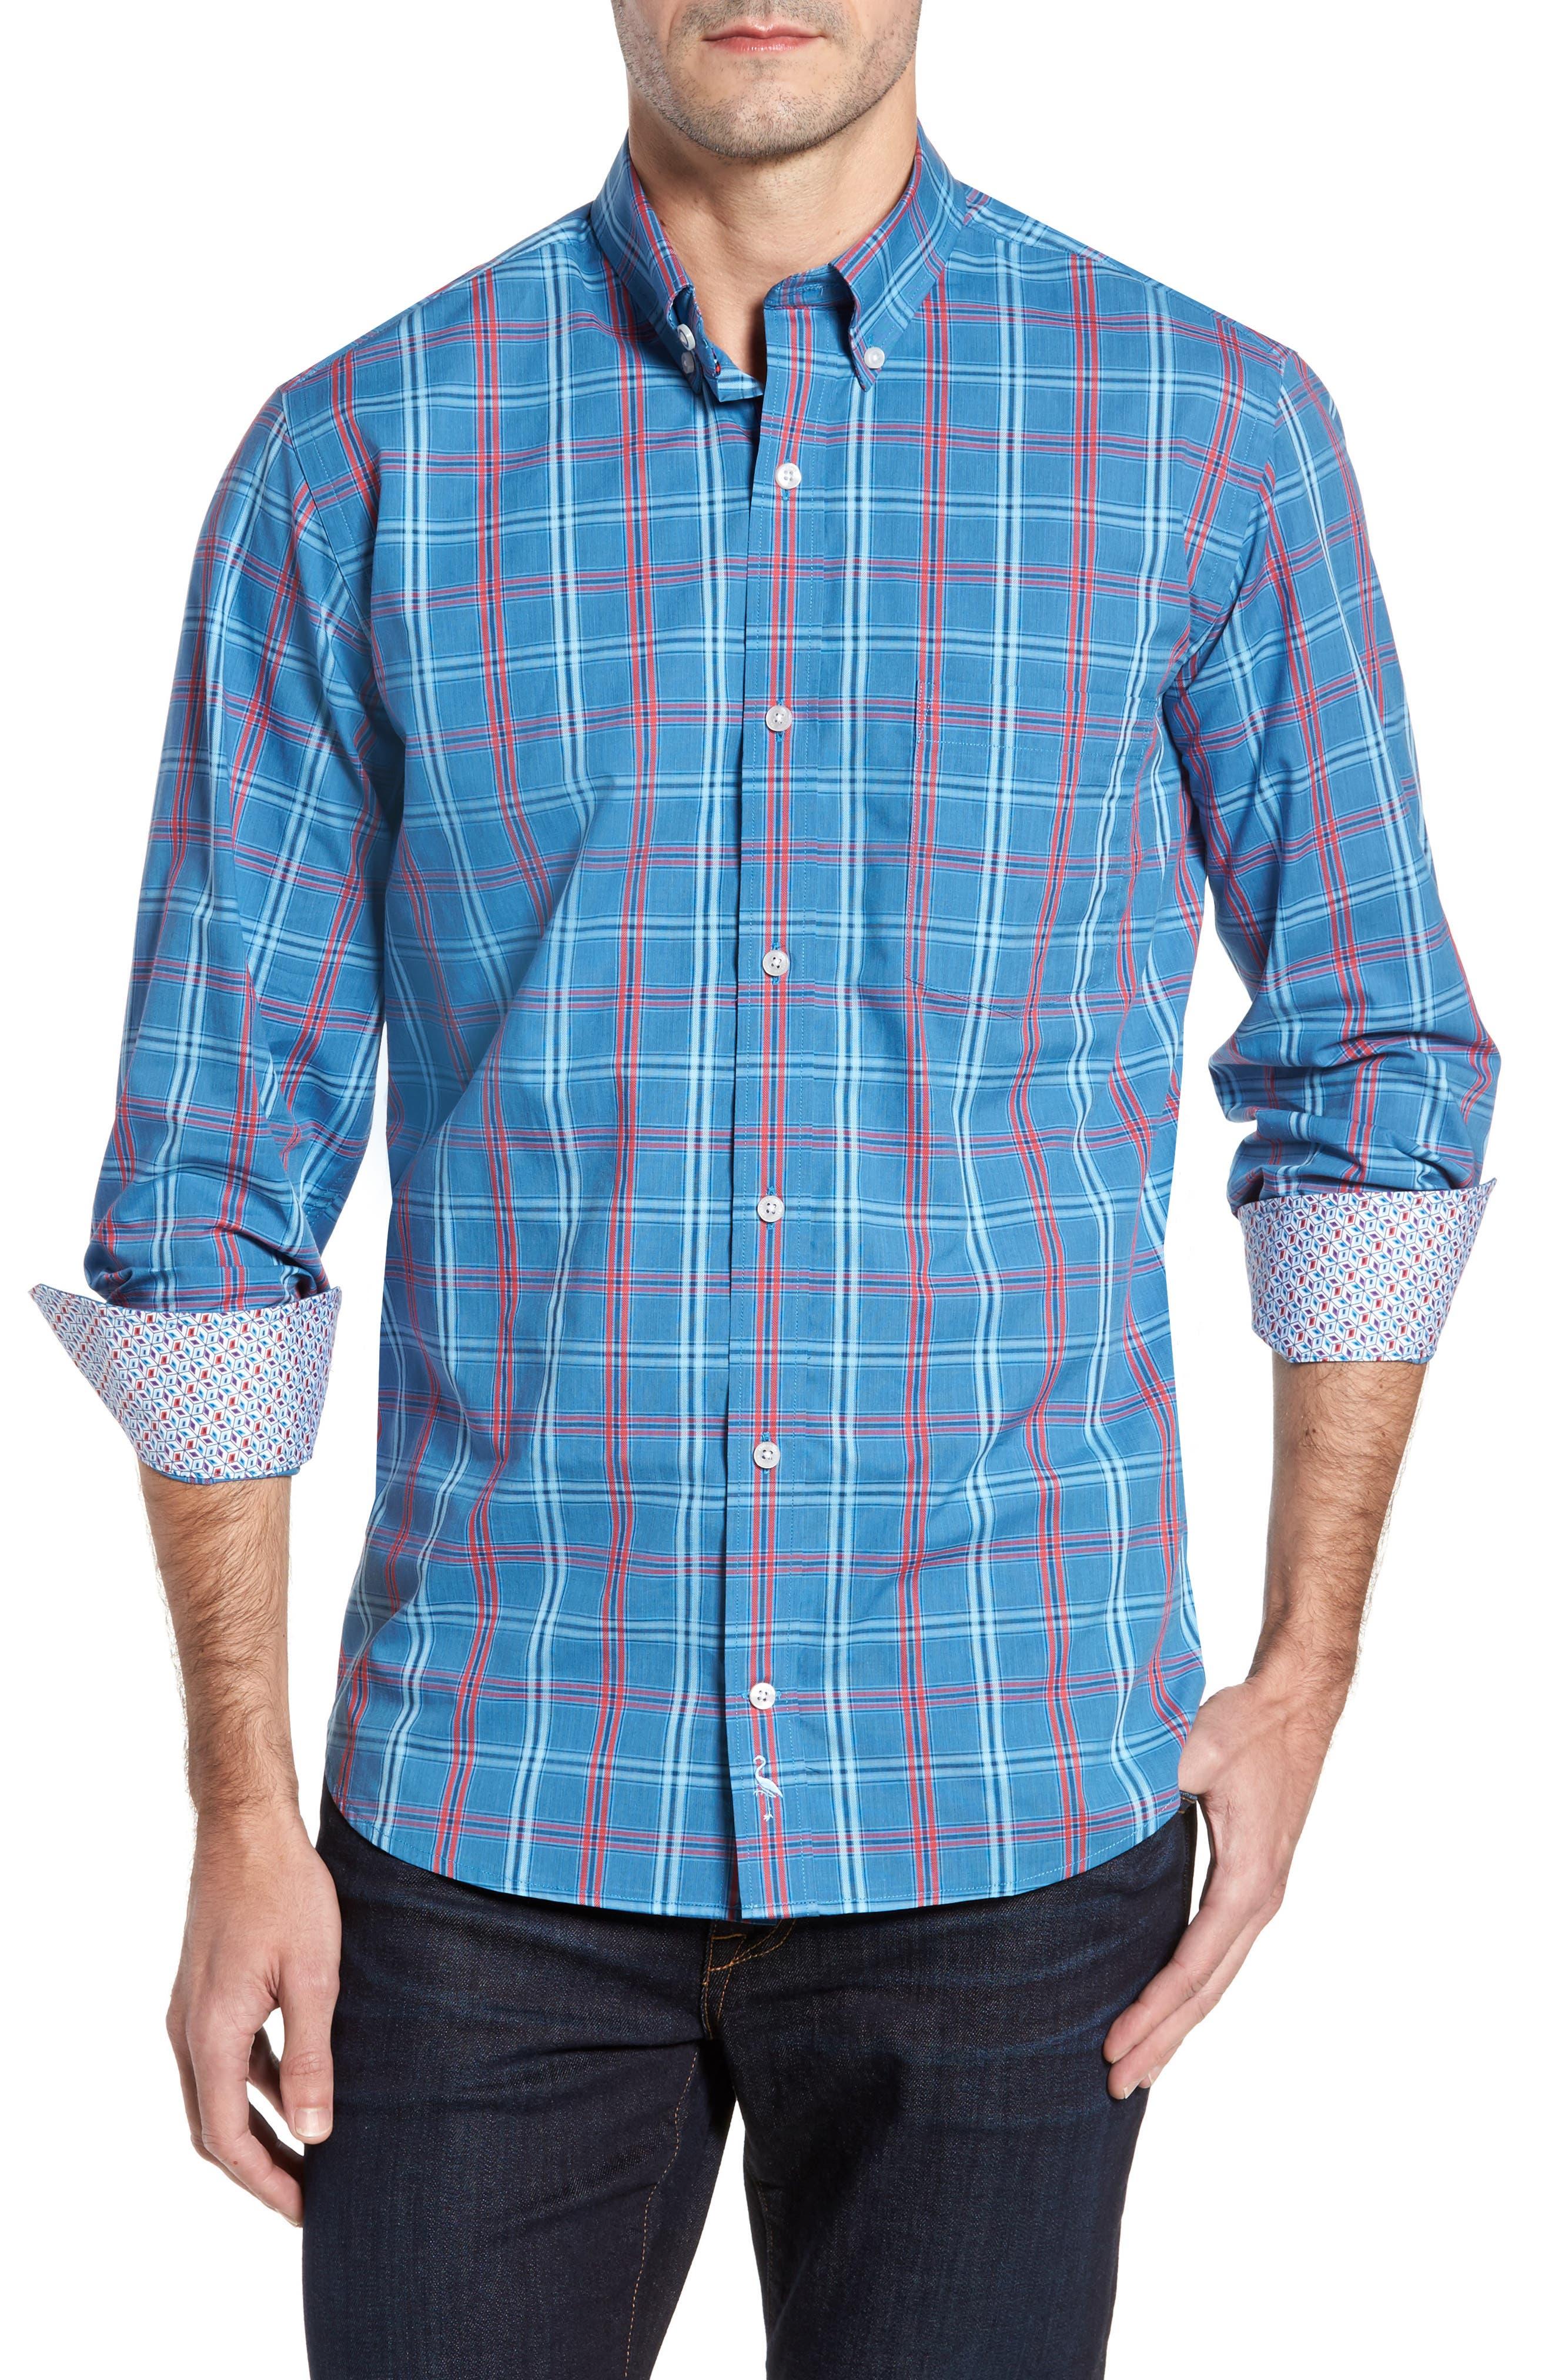 Main Image - TailorByrd Ashland Windowpane Check Sport Shirt